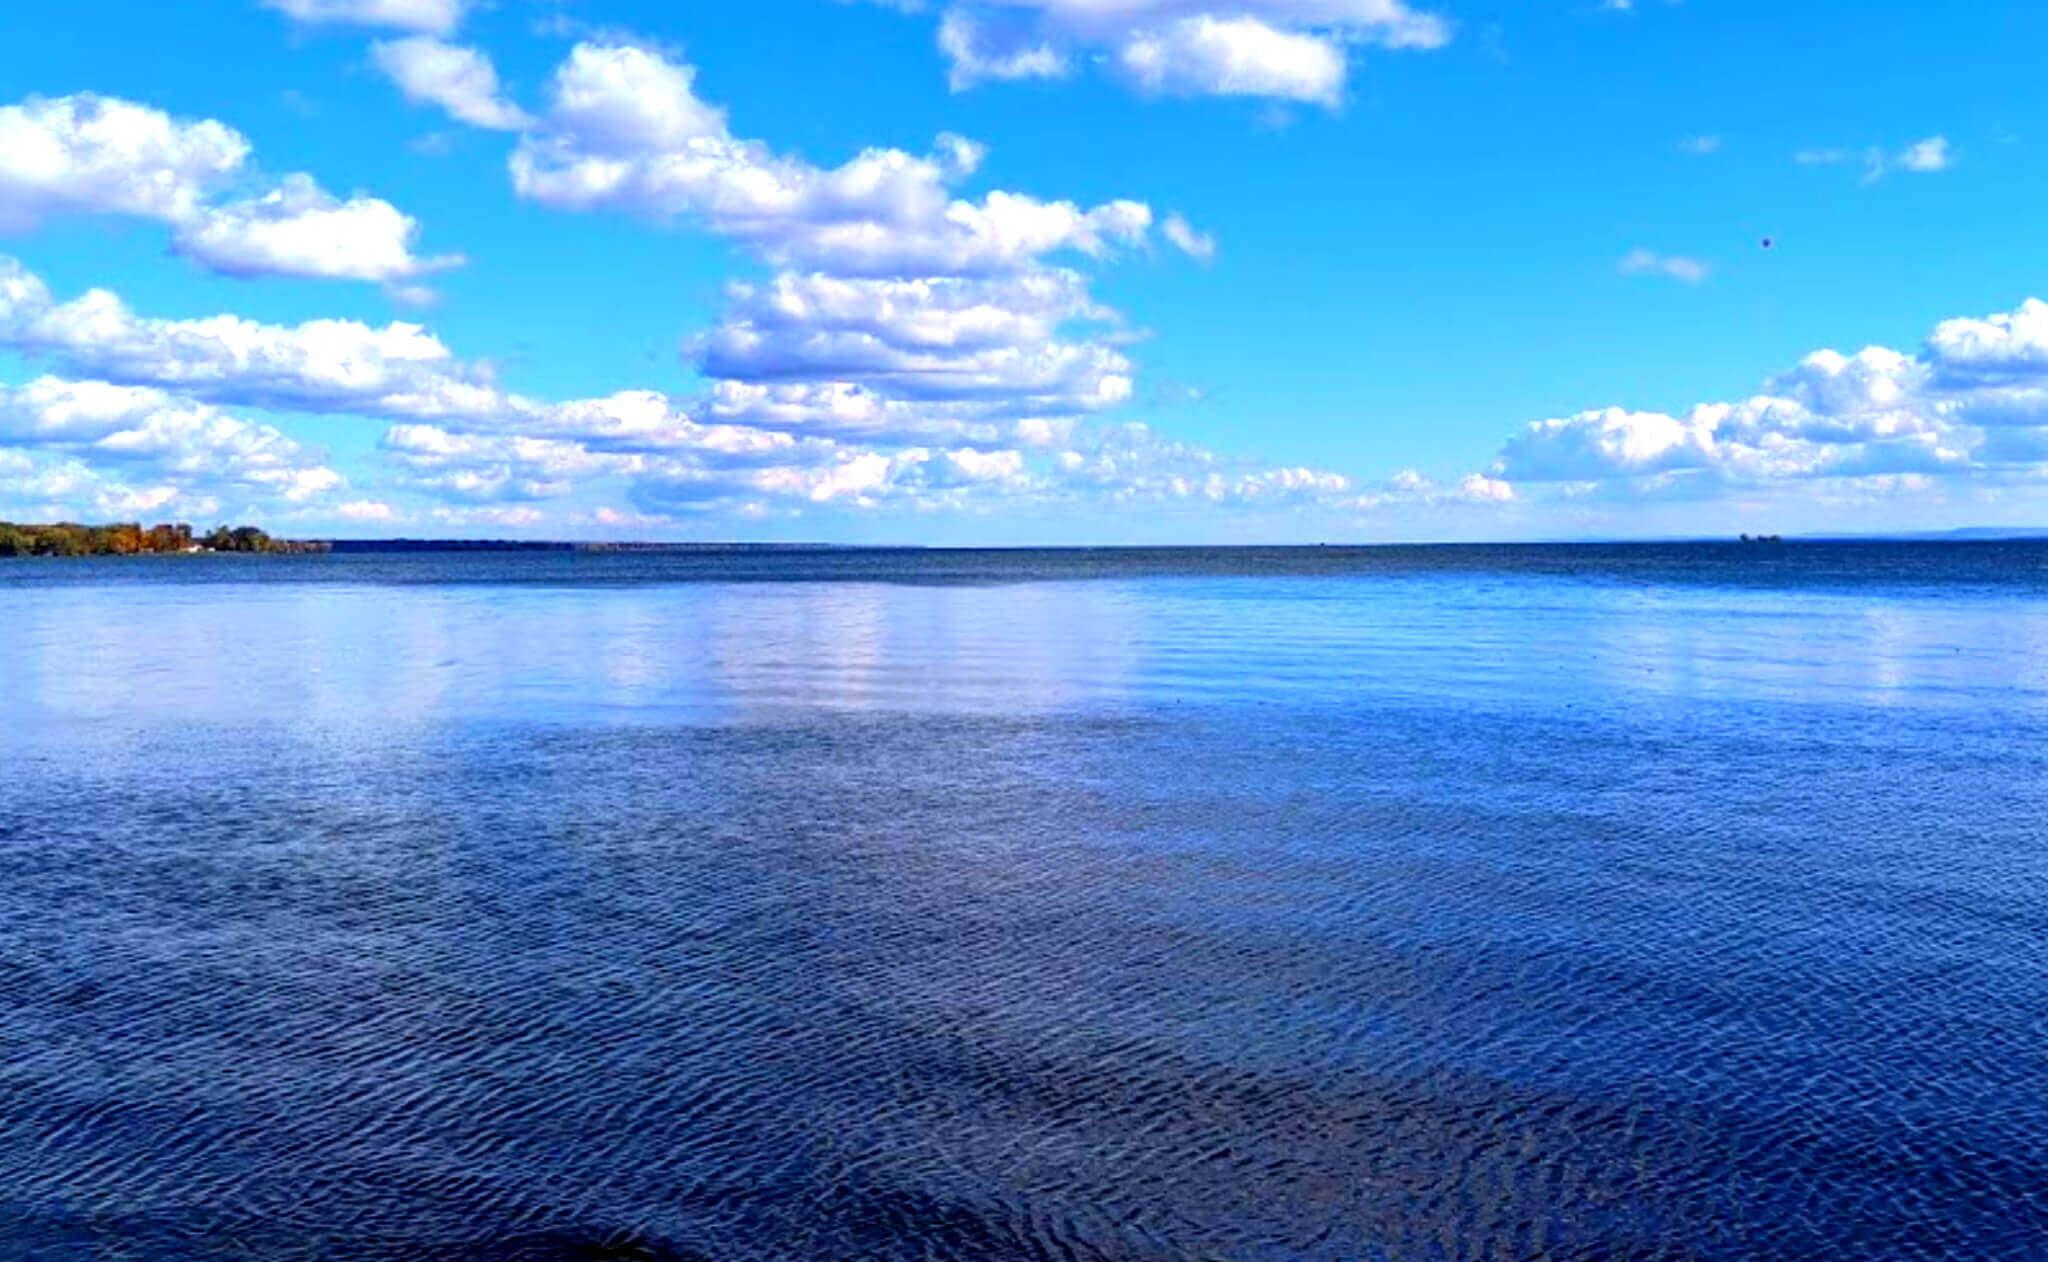 Oneida-Lake-Fishing-Report-Guide-New-York-NY-02